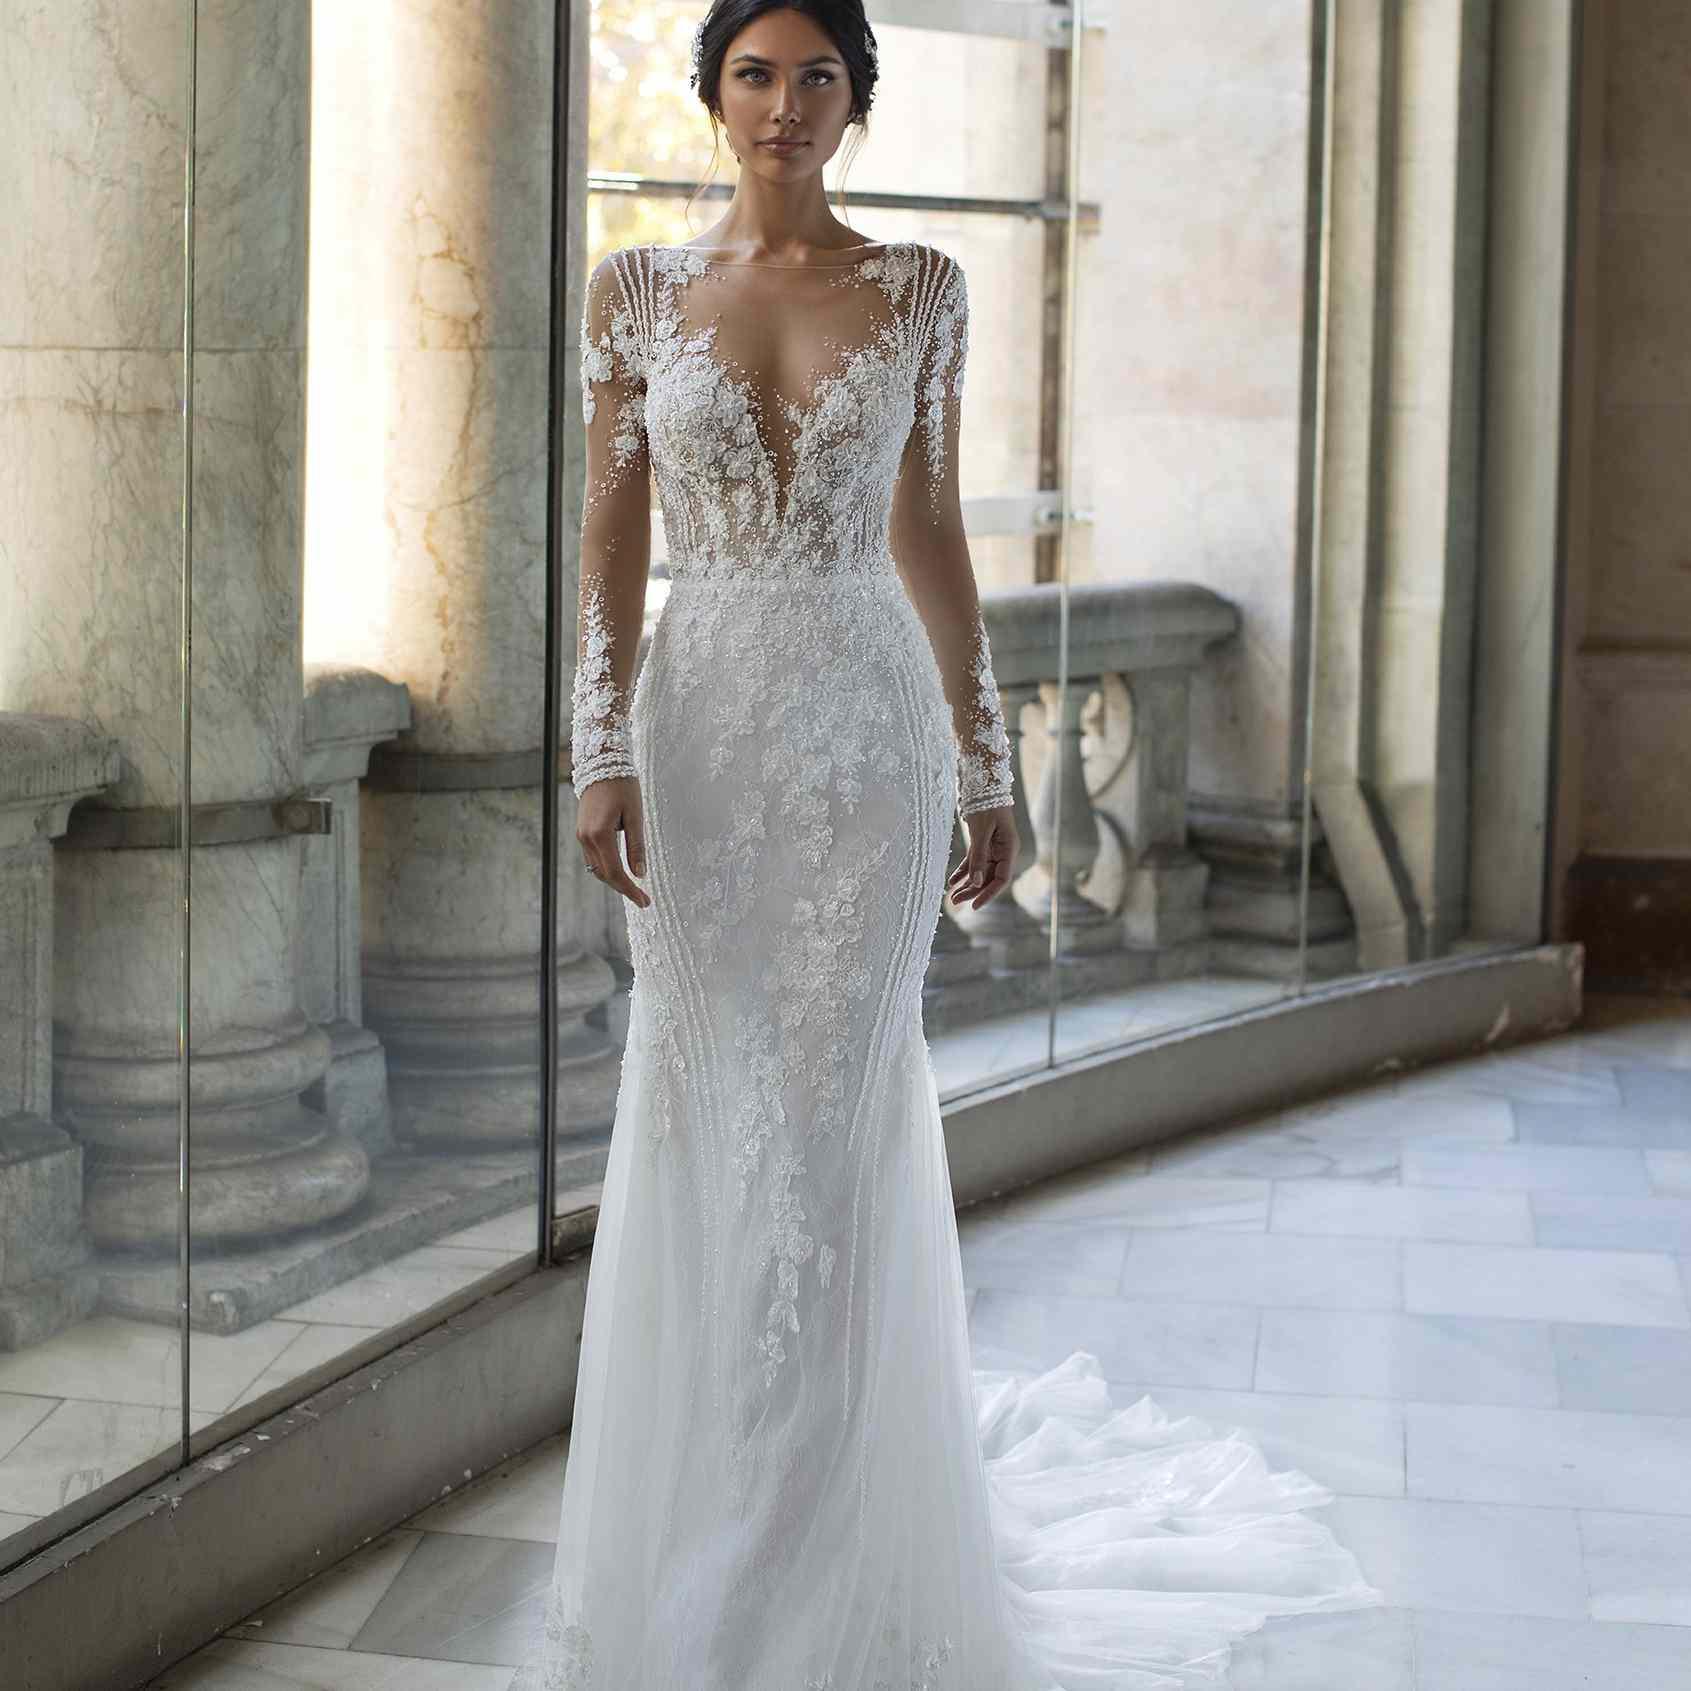 Pronovias Pickford Lace Wedding Dress, price upon request